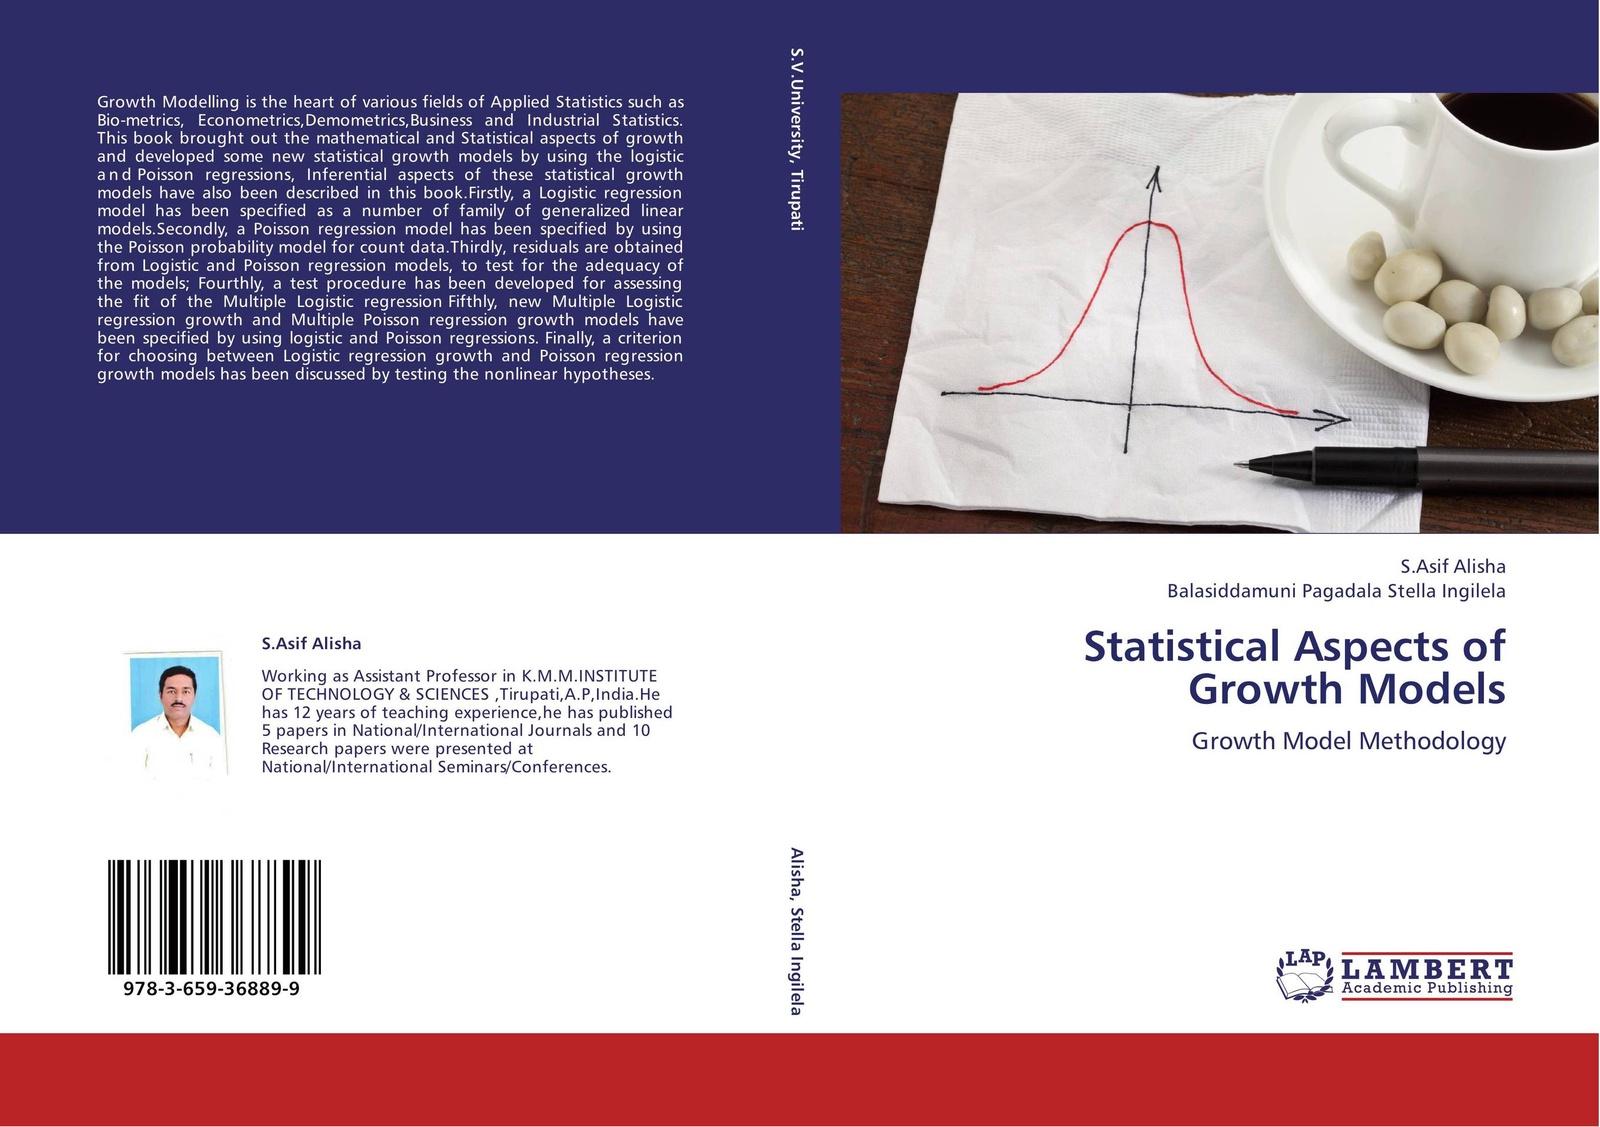 S.Asif Alisha and Balasiddamuni Pagadala Stella Ingilela Statistical Aspects of Growth Models